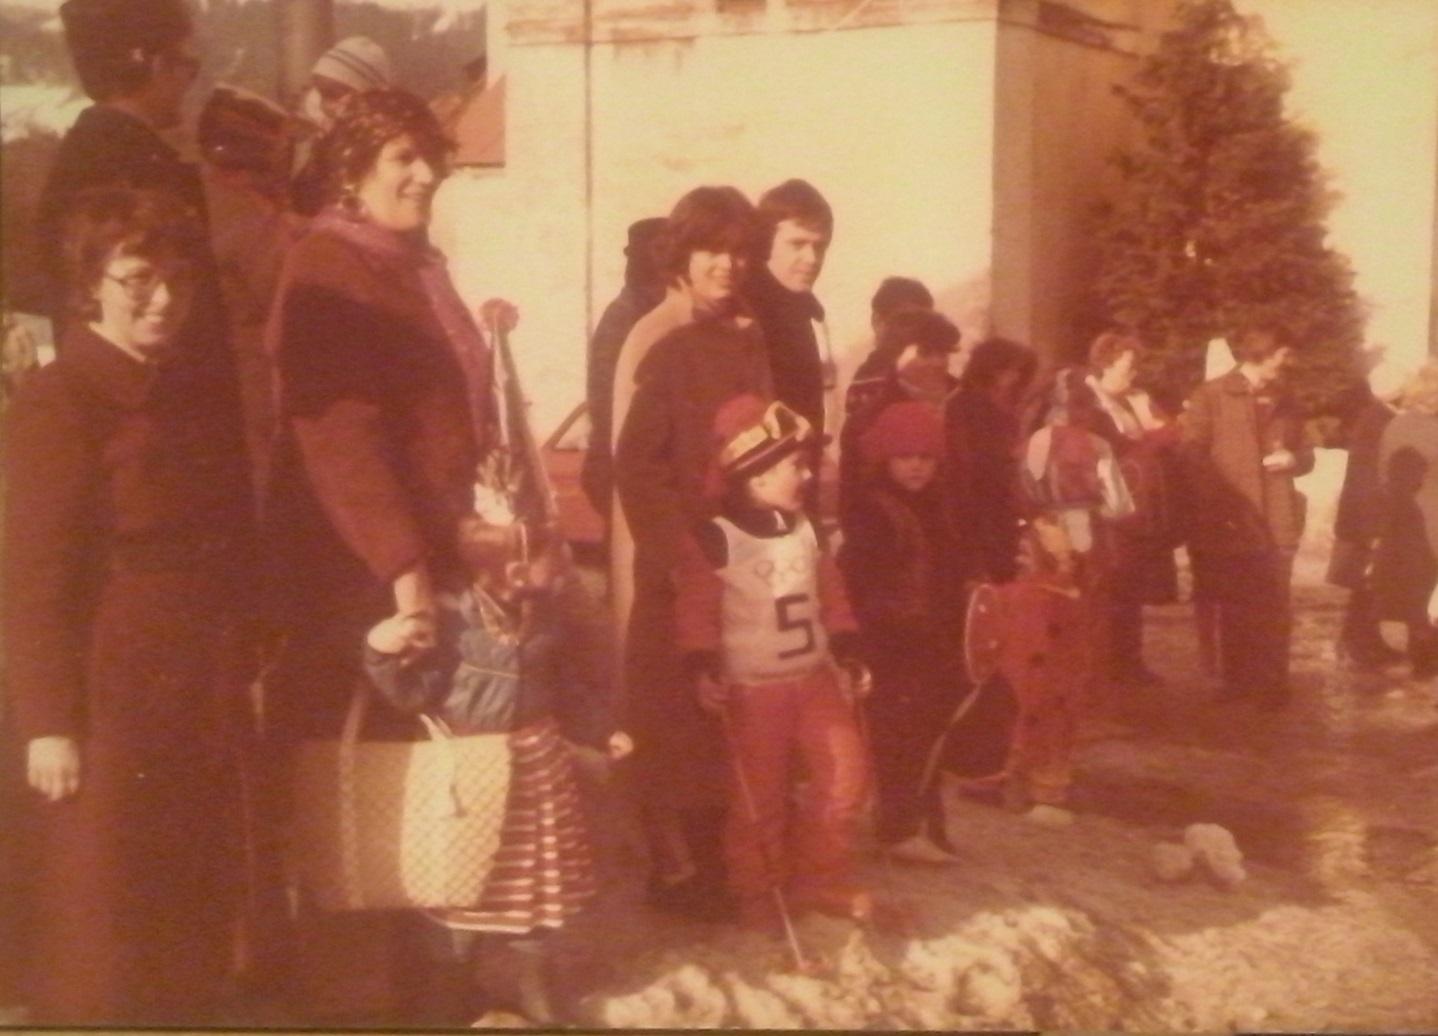 http://shramba.lovrenc.net/maxi/klepet/cam11217pustna-pov-1984.jpg